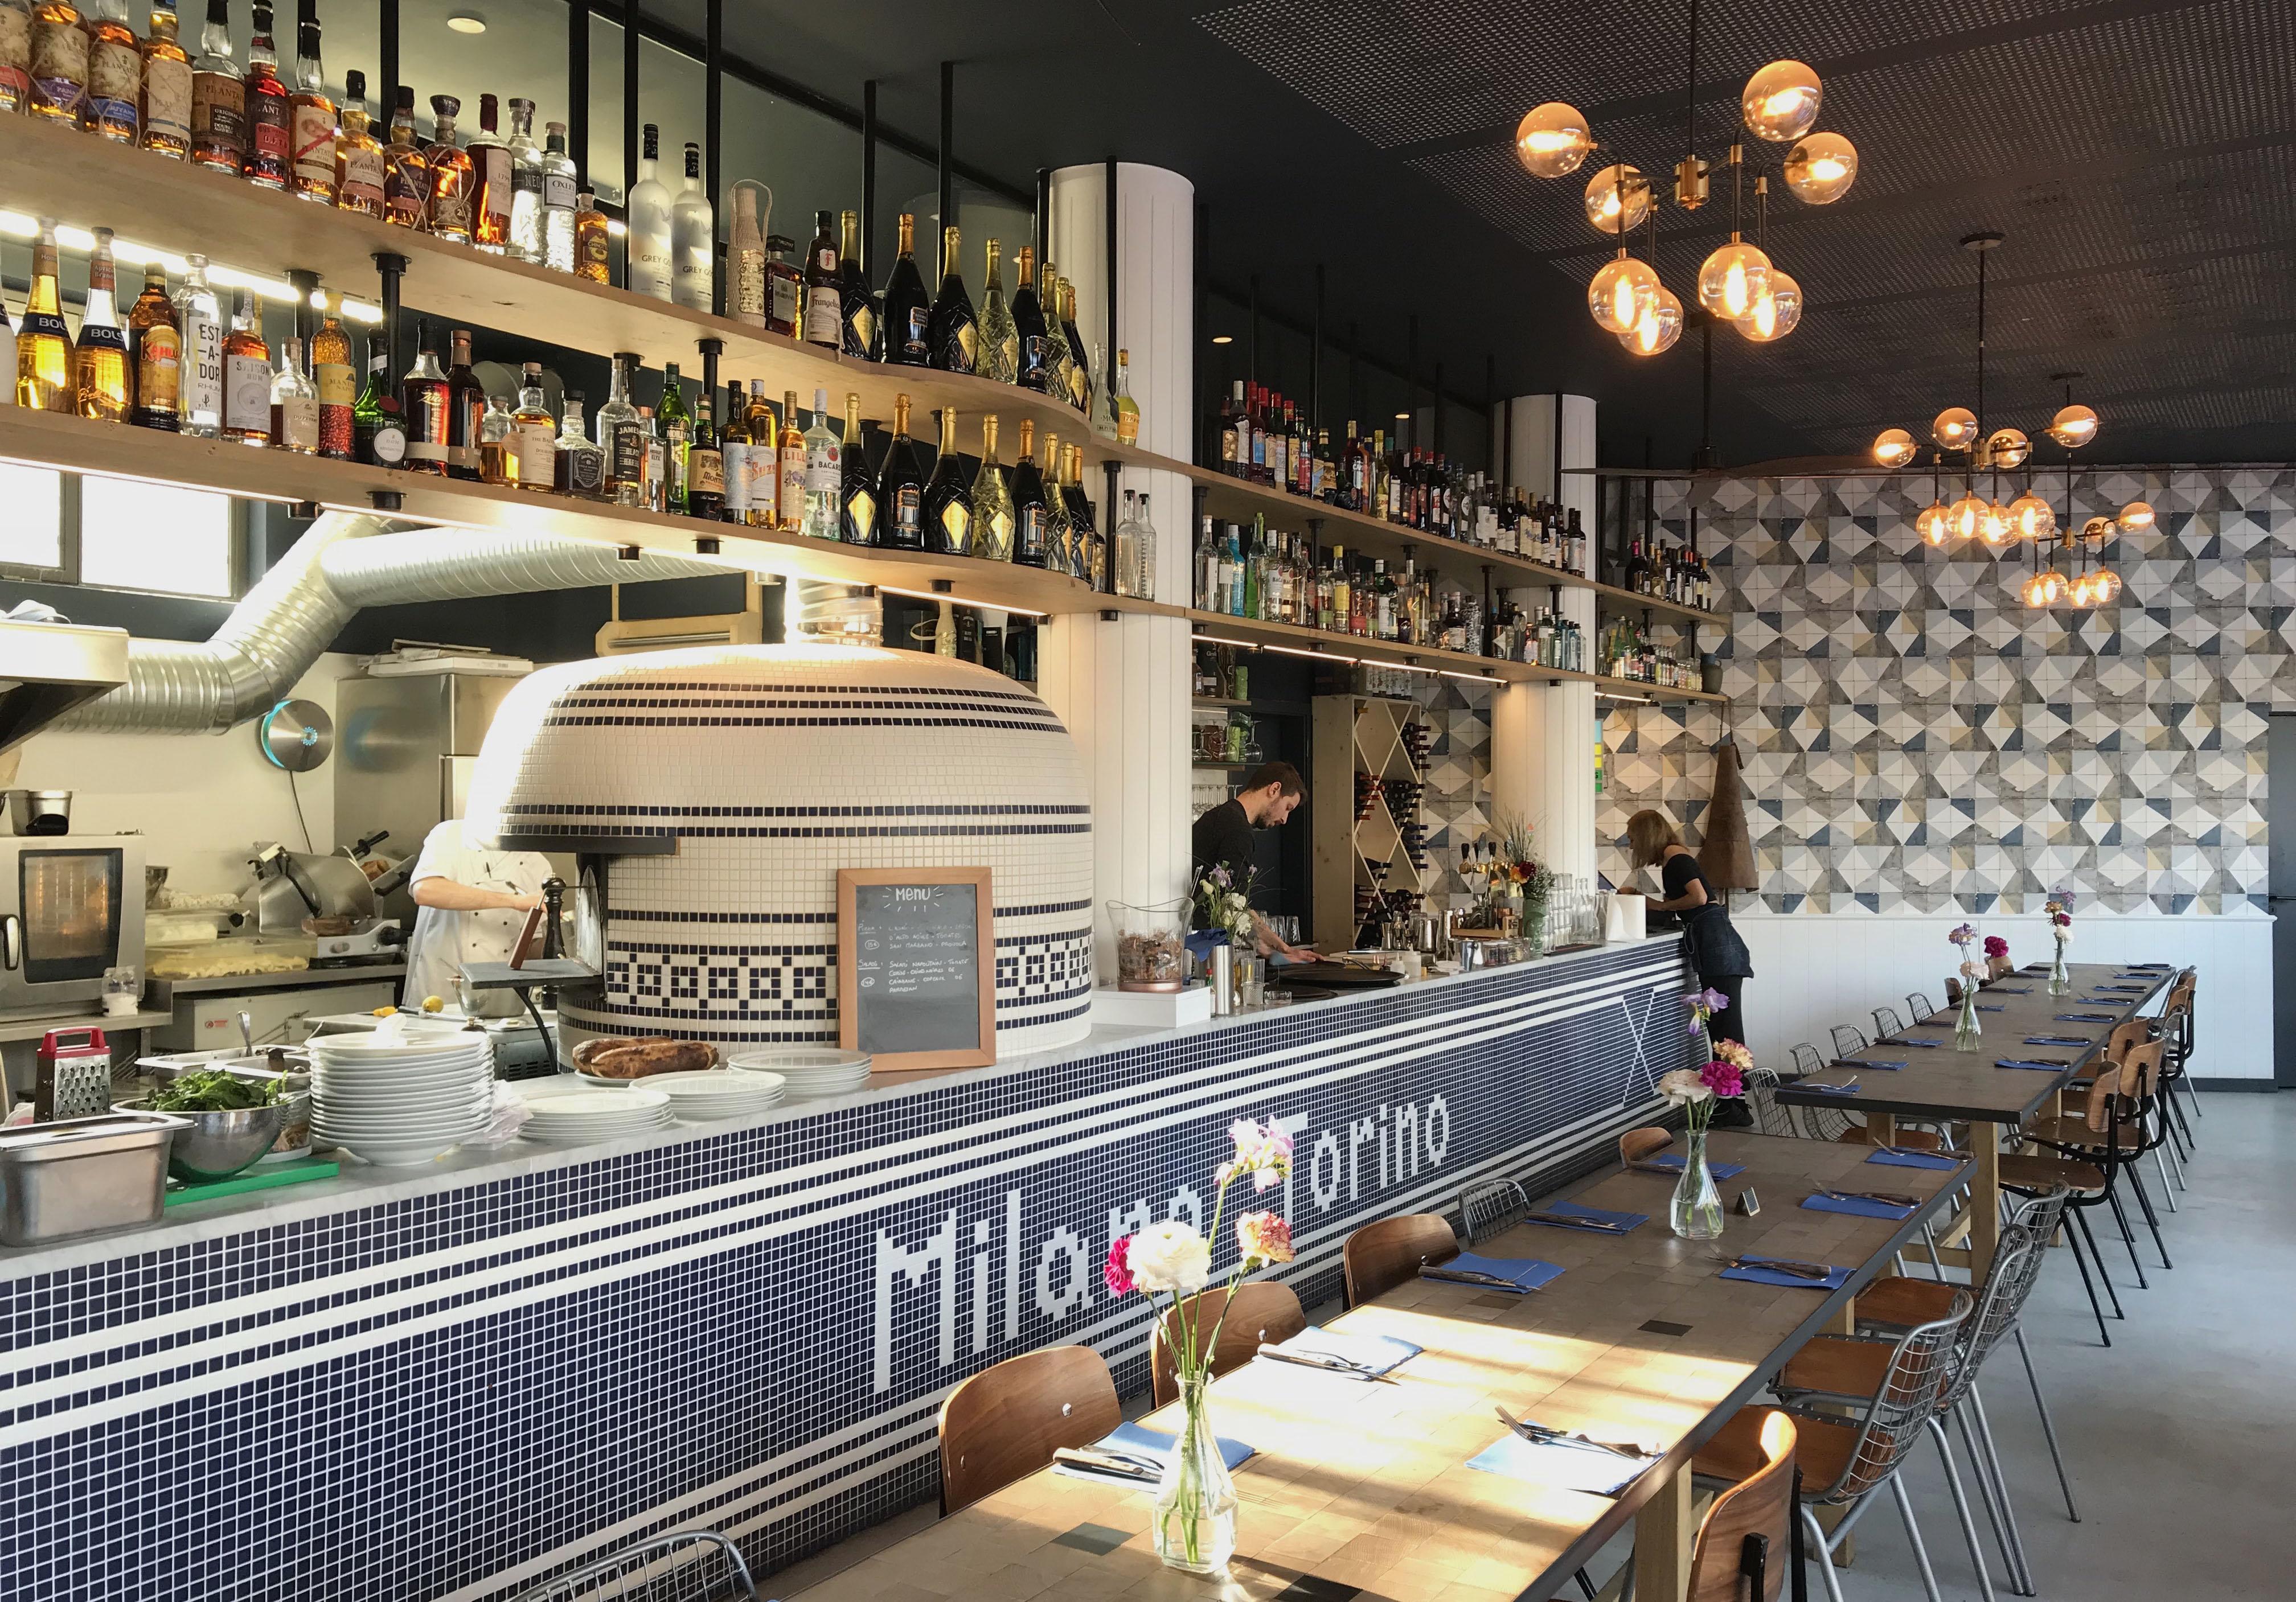 Milano-Torino MiTo strasbourg tables